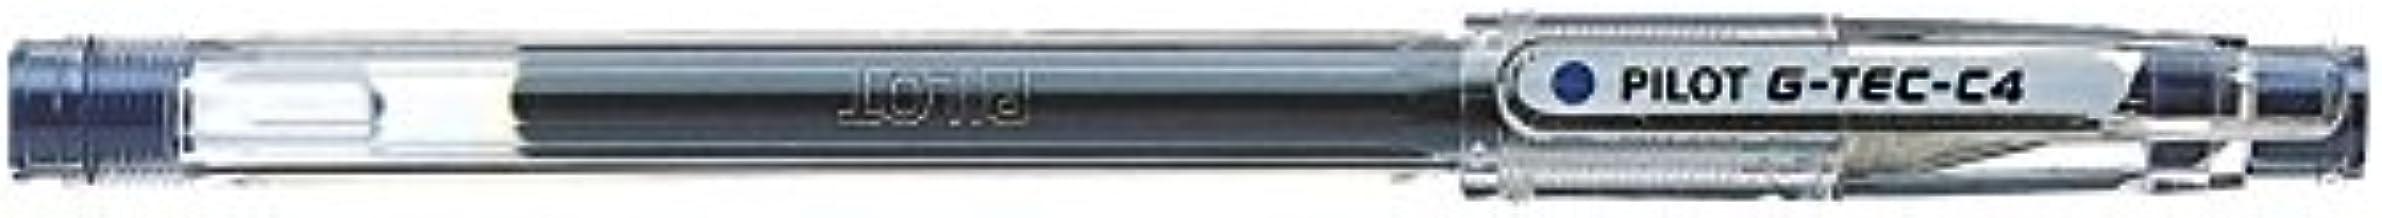 Penna a sfera G-TEC-C4 blu 0.4mm Pilot, roller